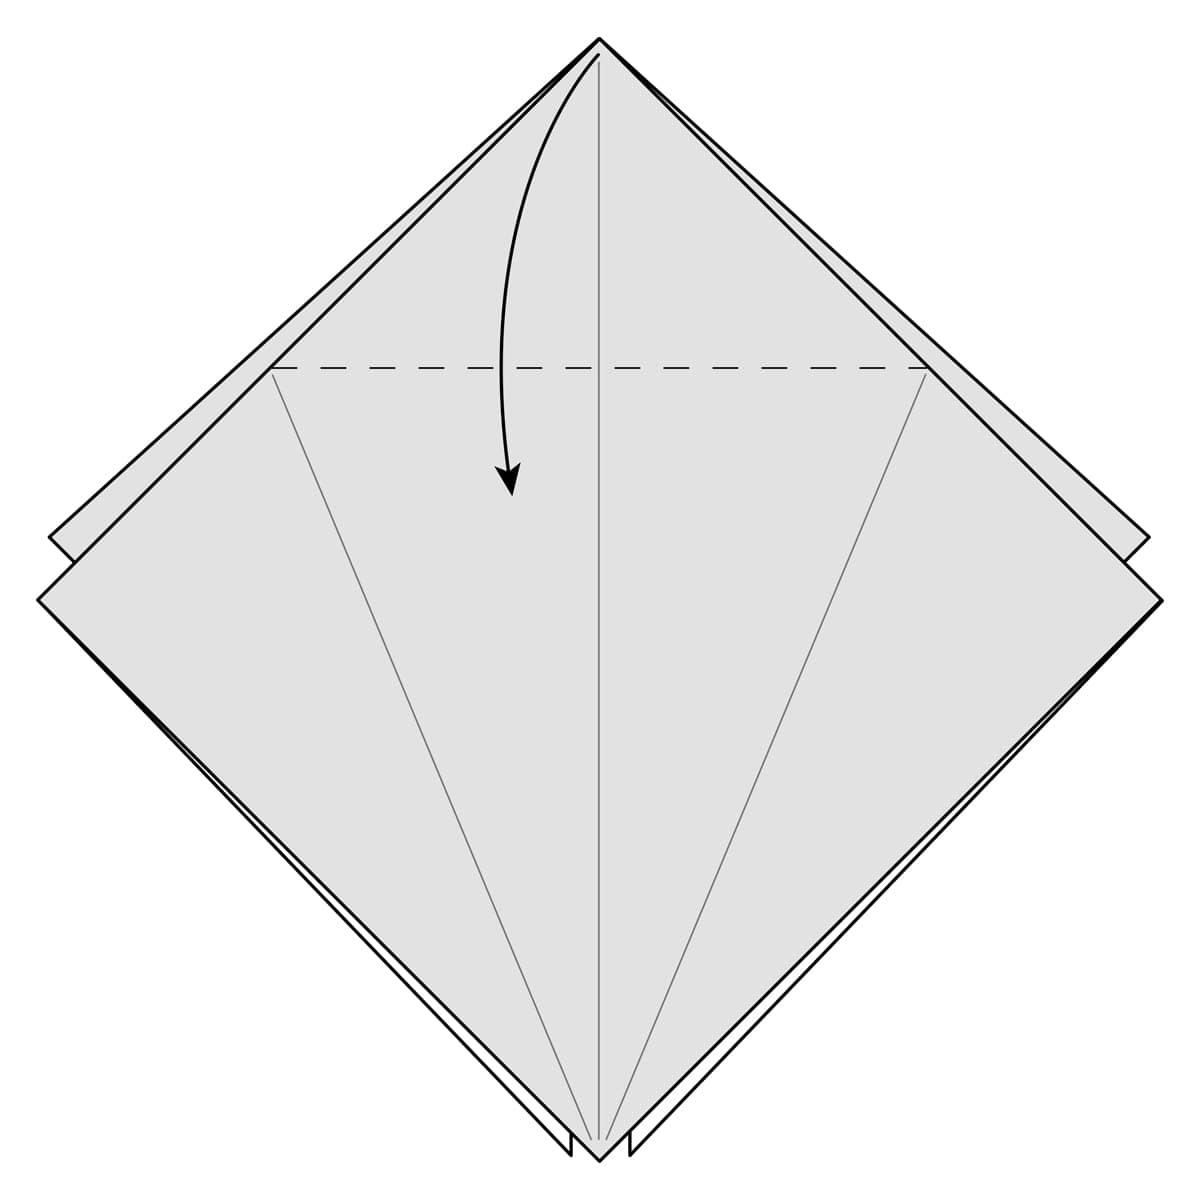 Petal Fold Step 5